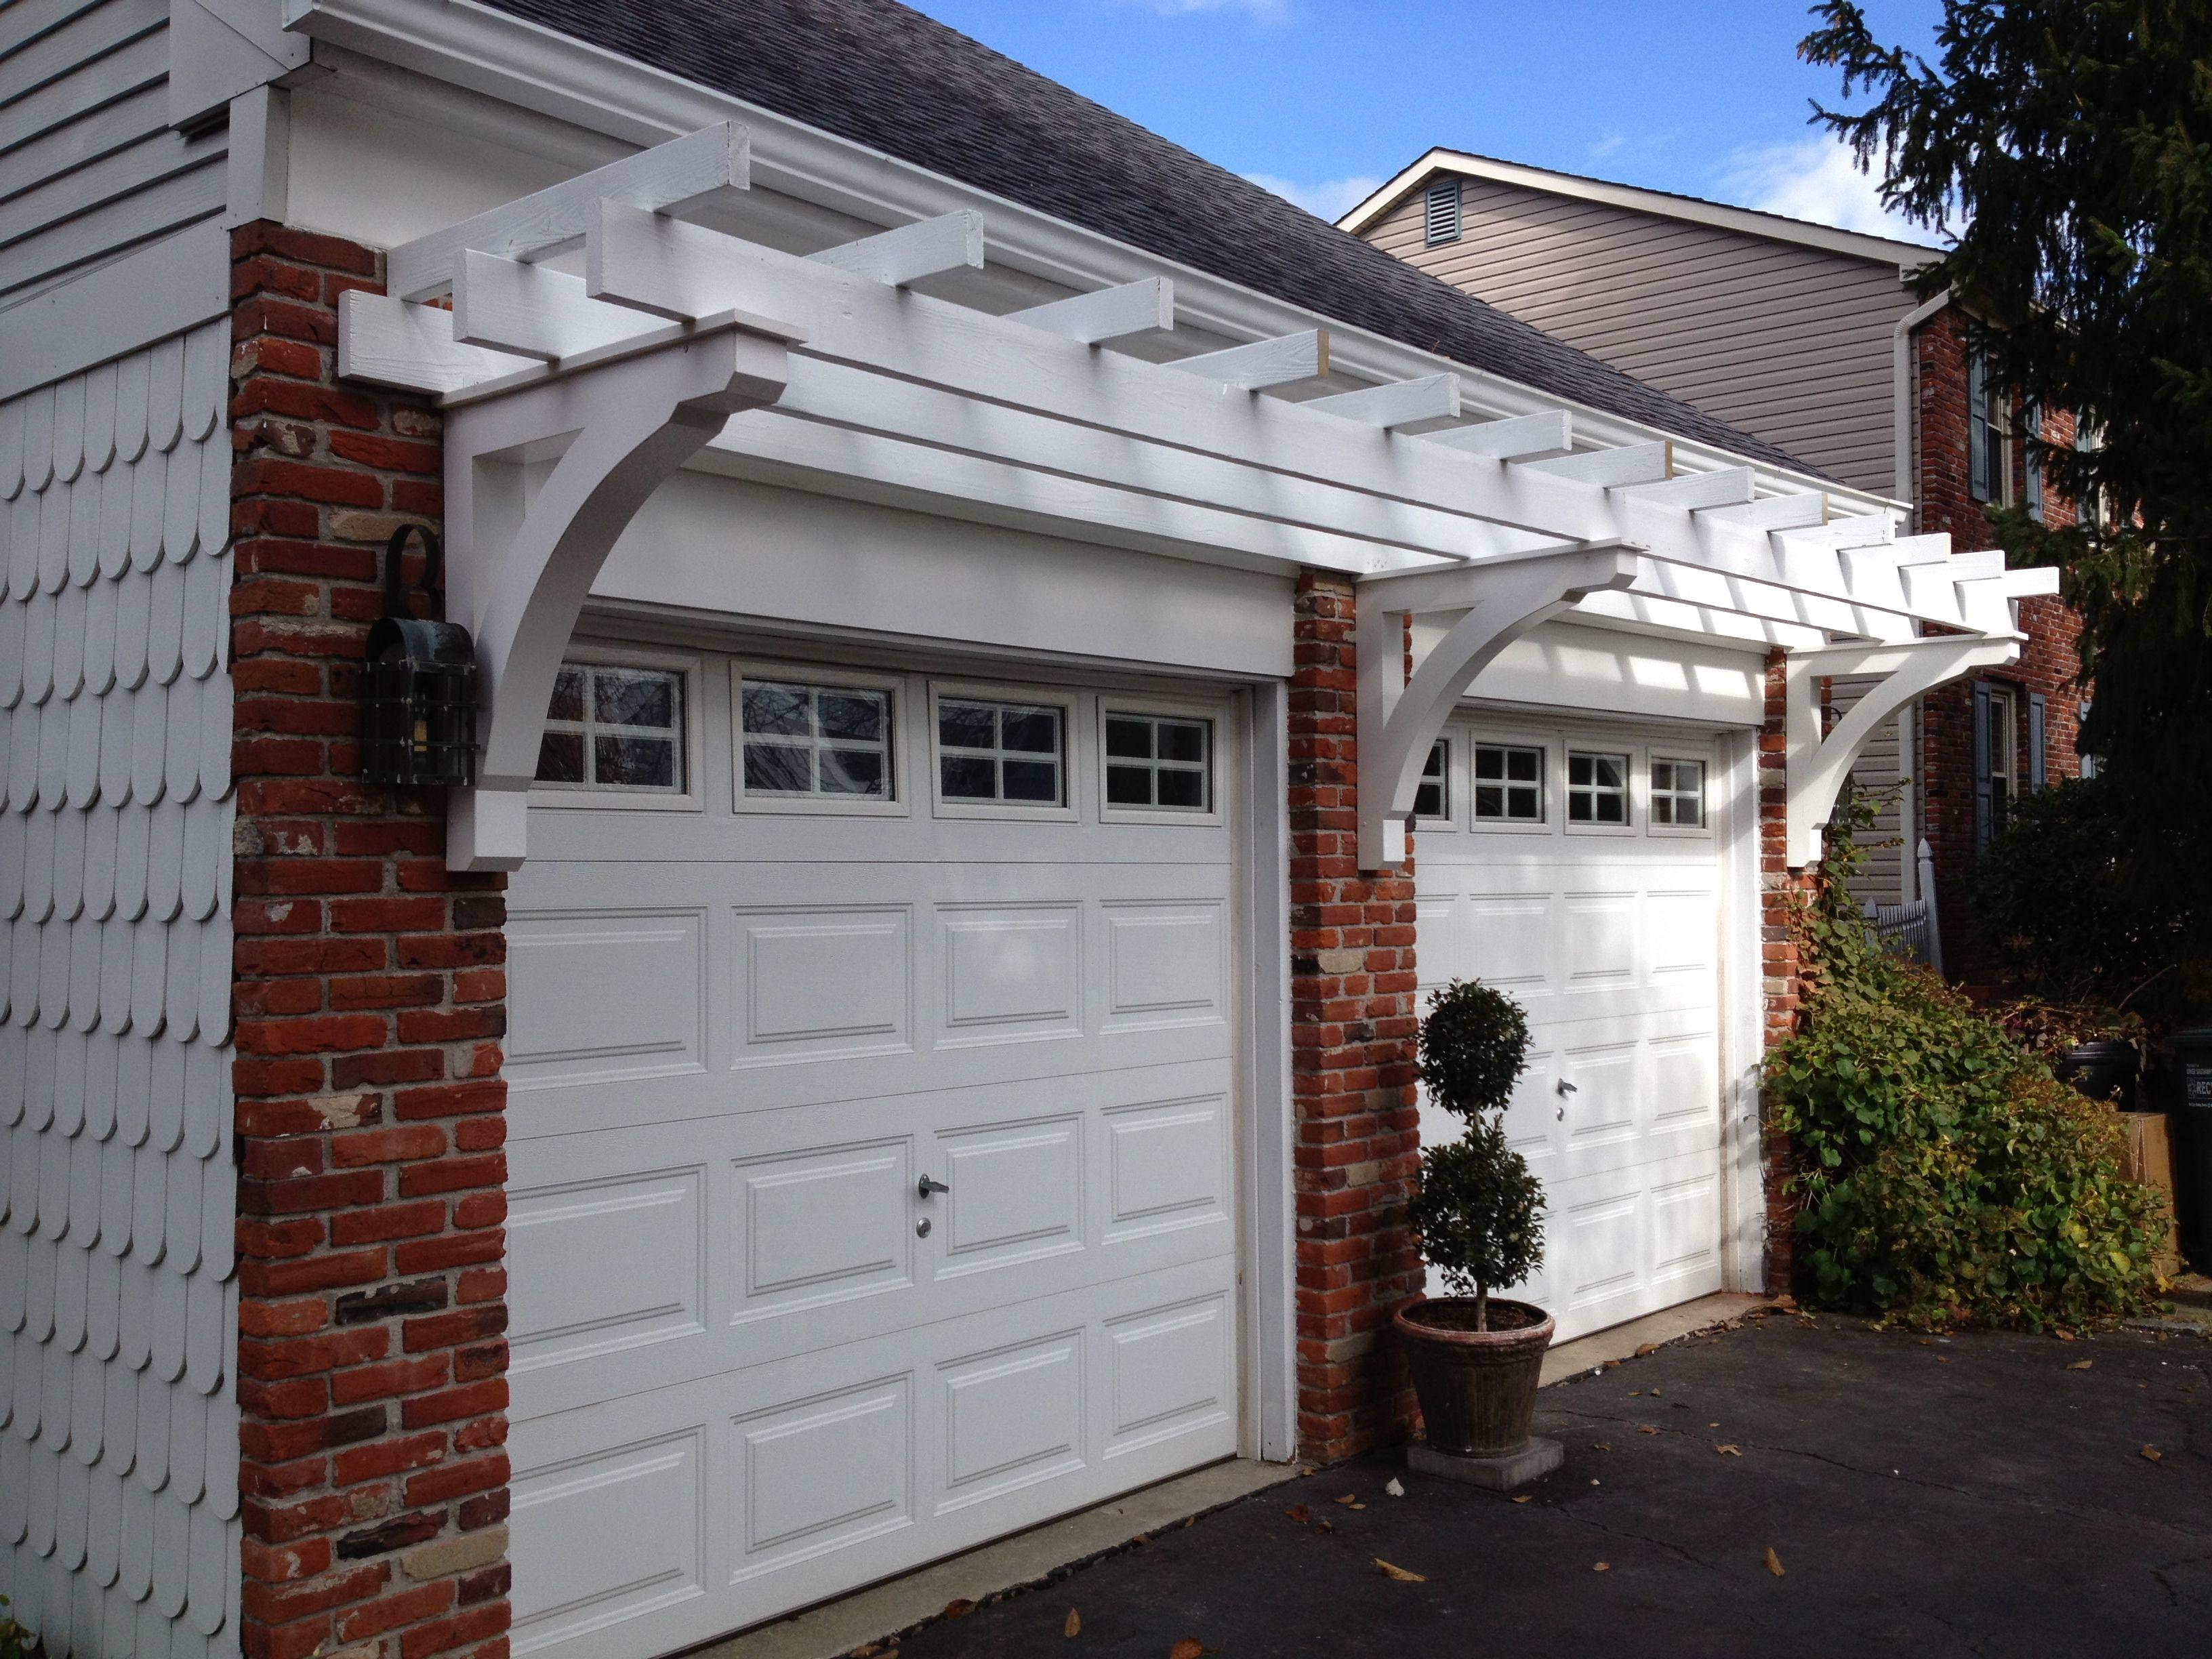 garage pergola pergolas pinterest how to design the perfect pergola for your garden